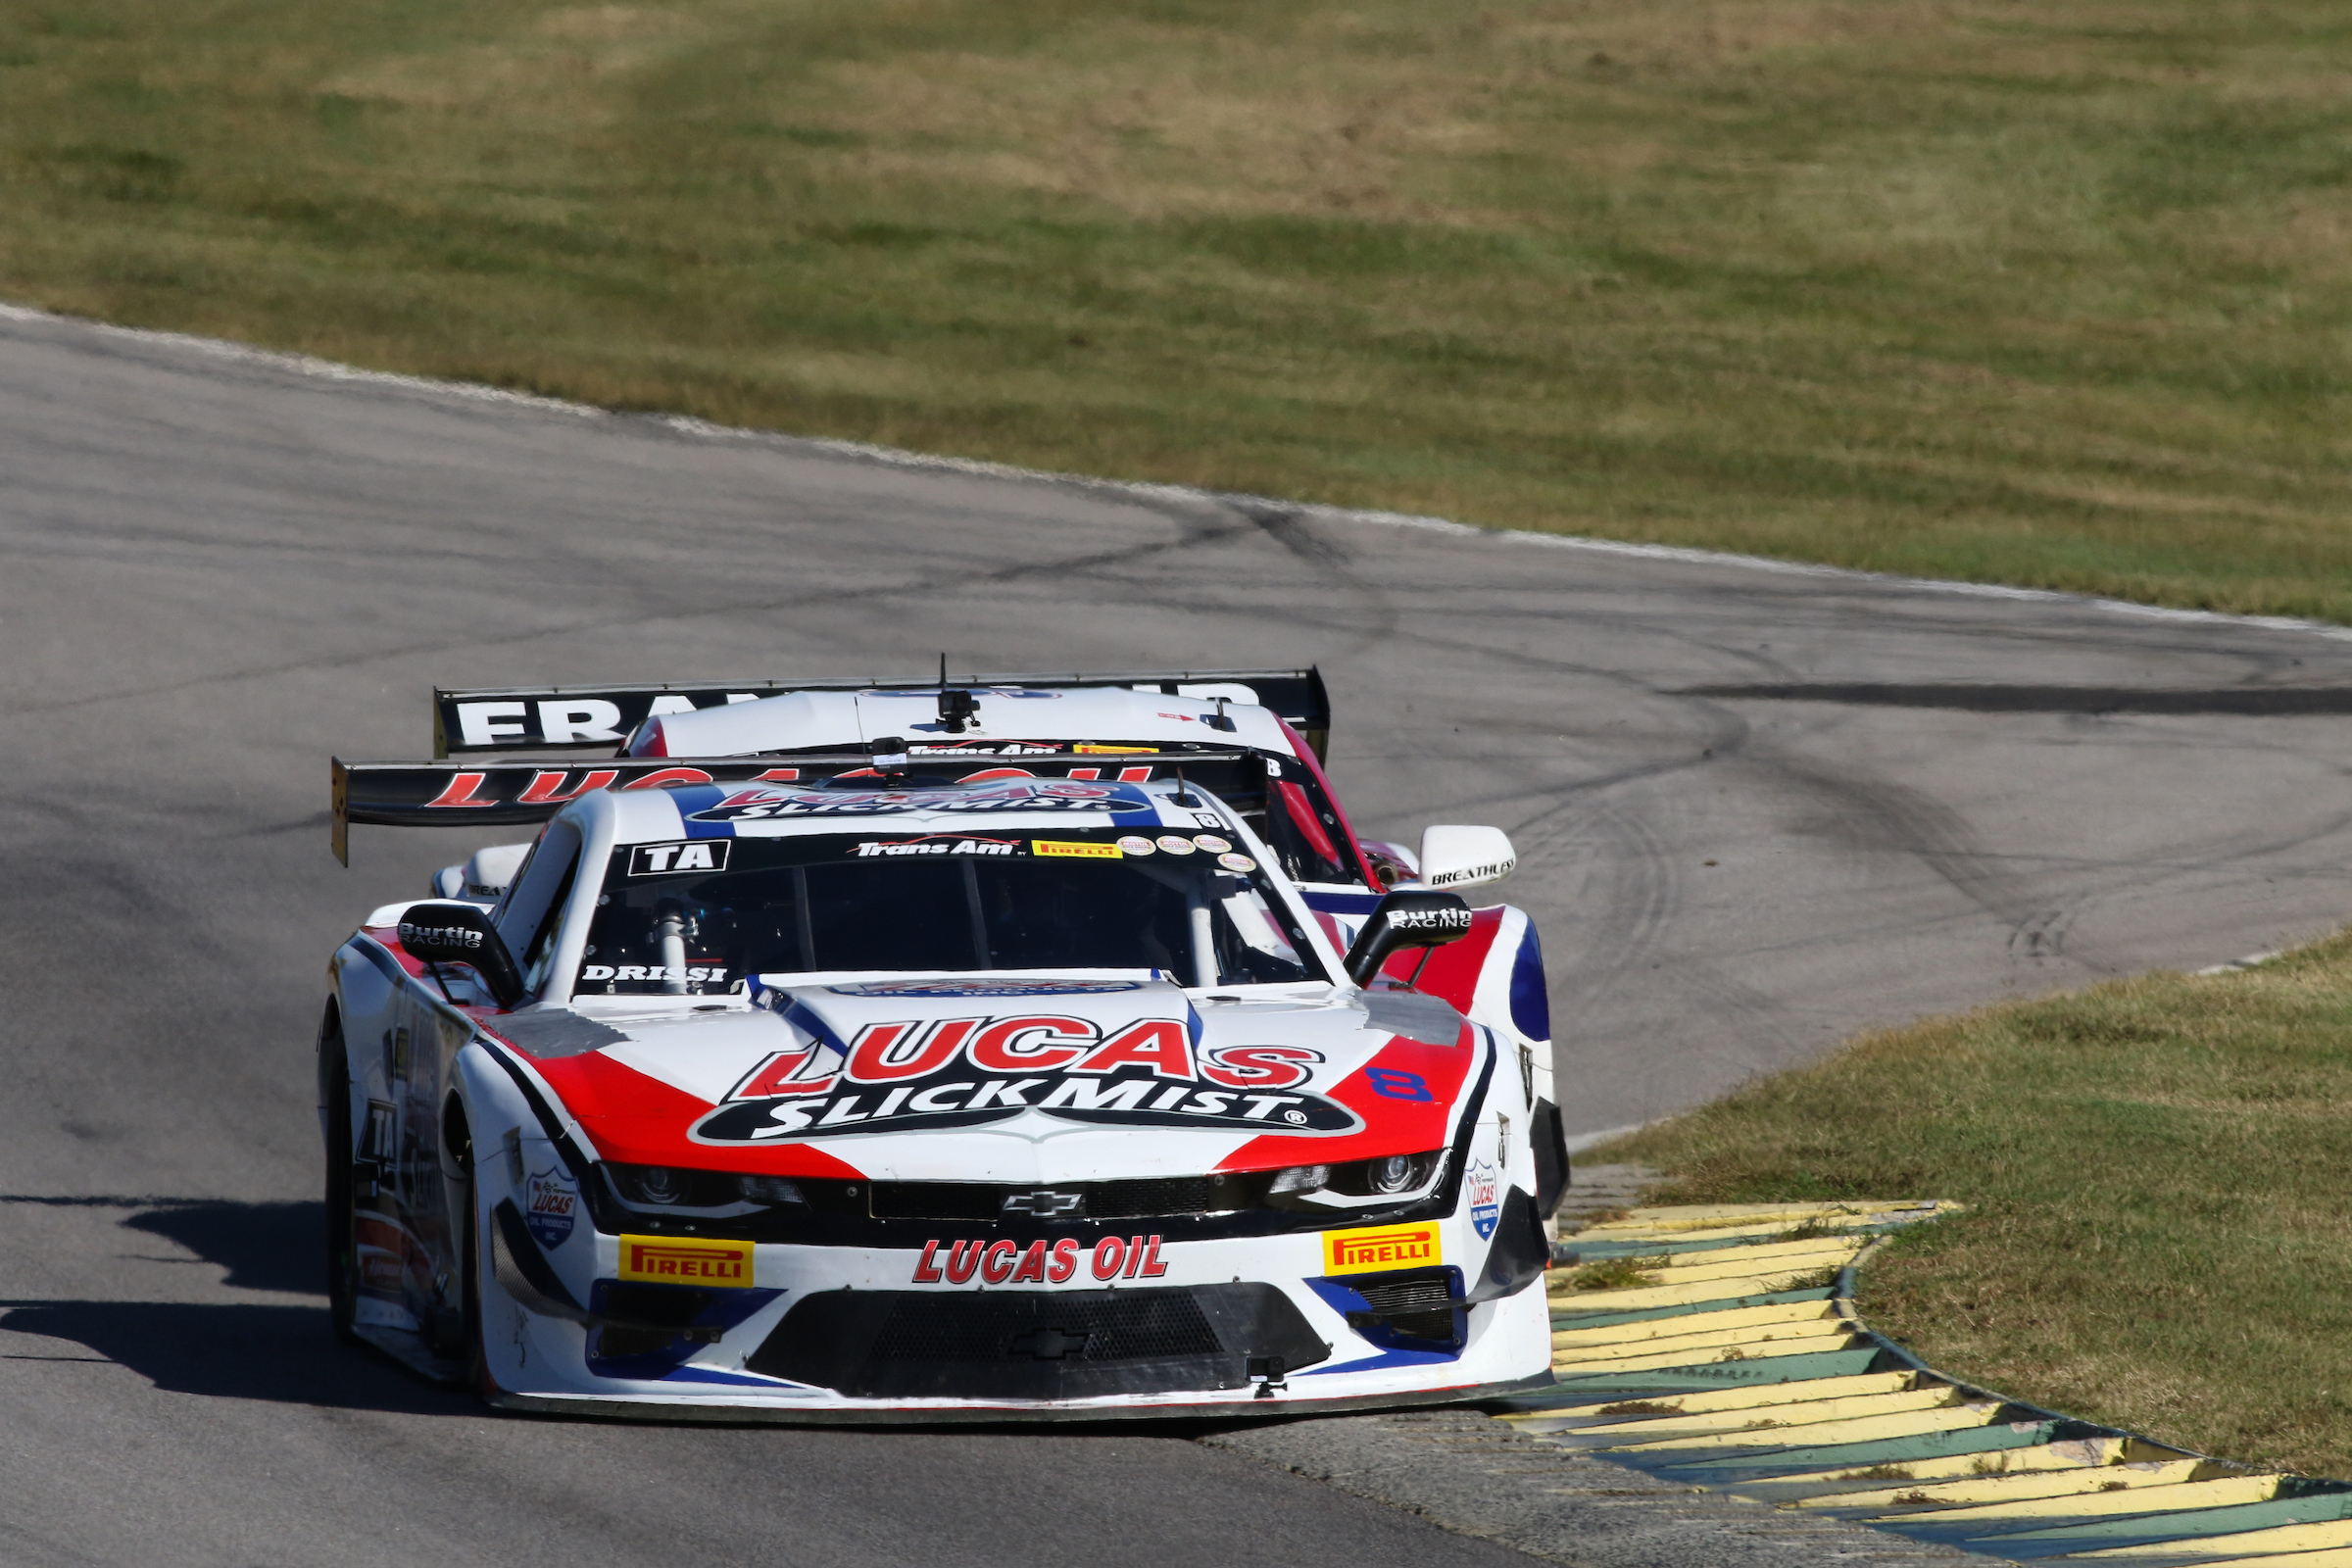 Lucas SlickMist Driver Tomy Drissi Watches Championship Slip Away as He Retires Early at Virginia International Raceway